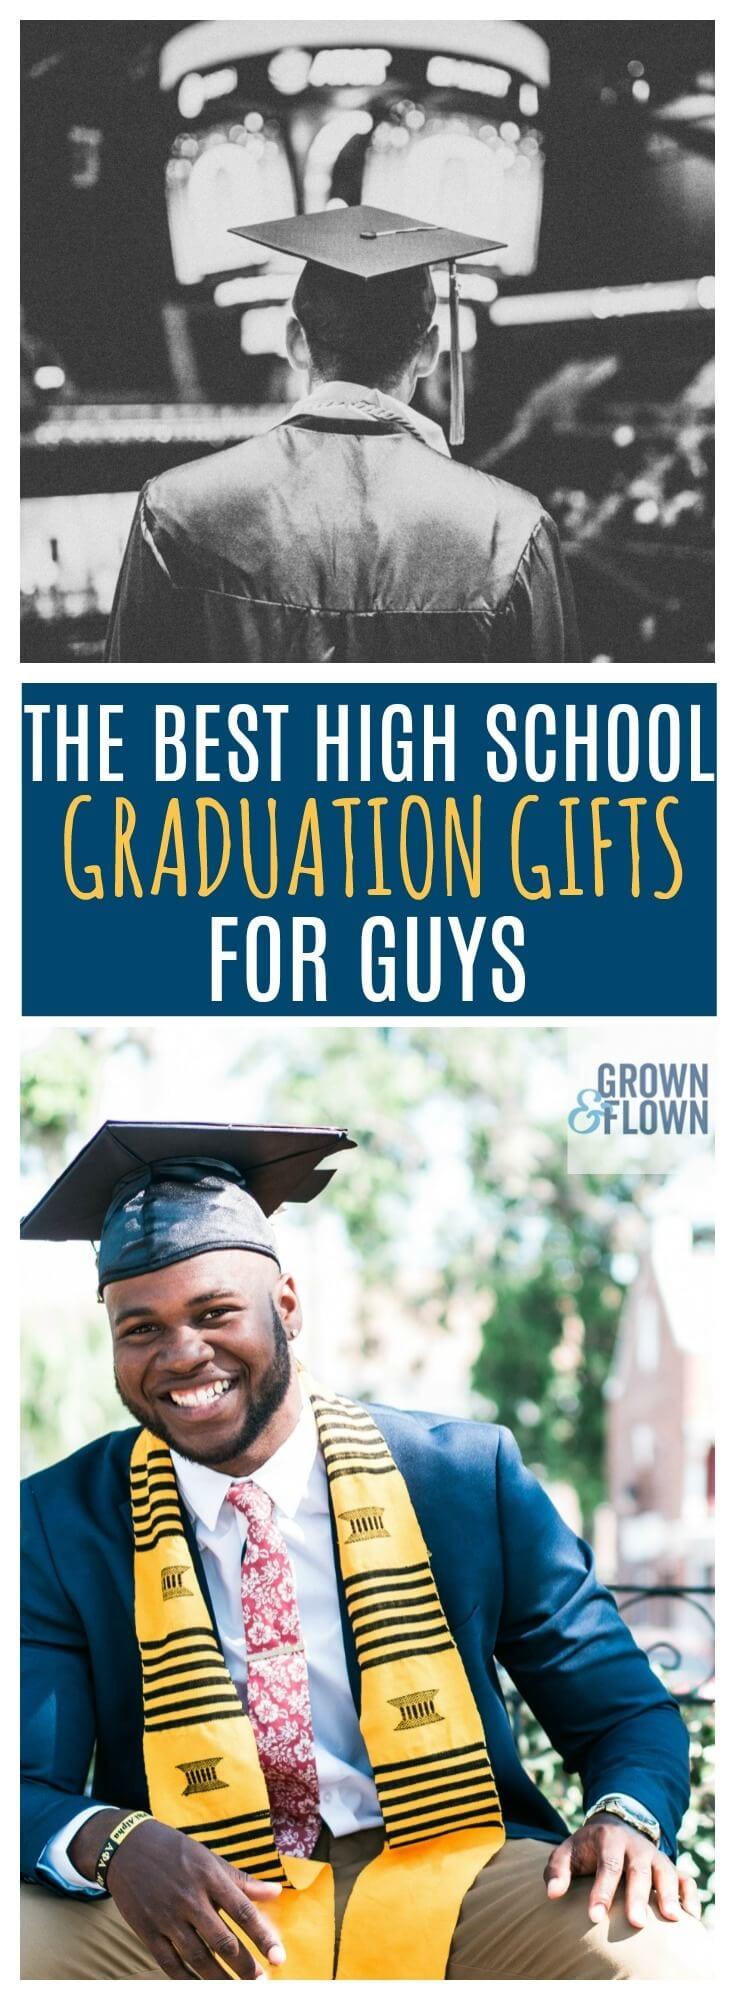 High School Graduation Gift Ideas For Guys  2020 High School Graduation Gifts for Guys They Will Love